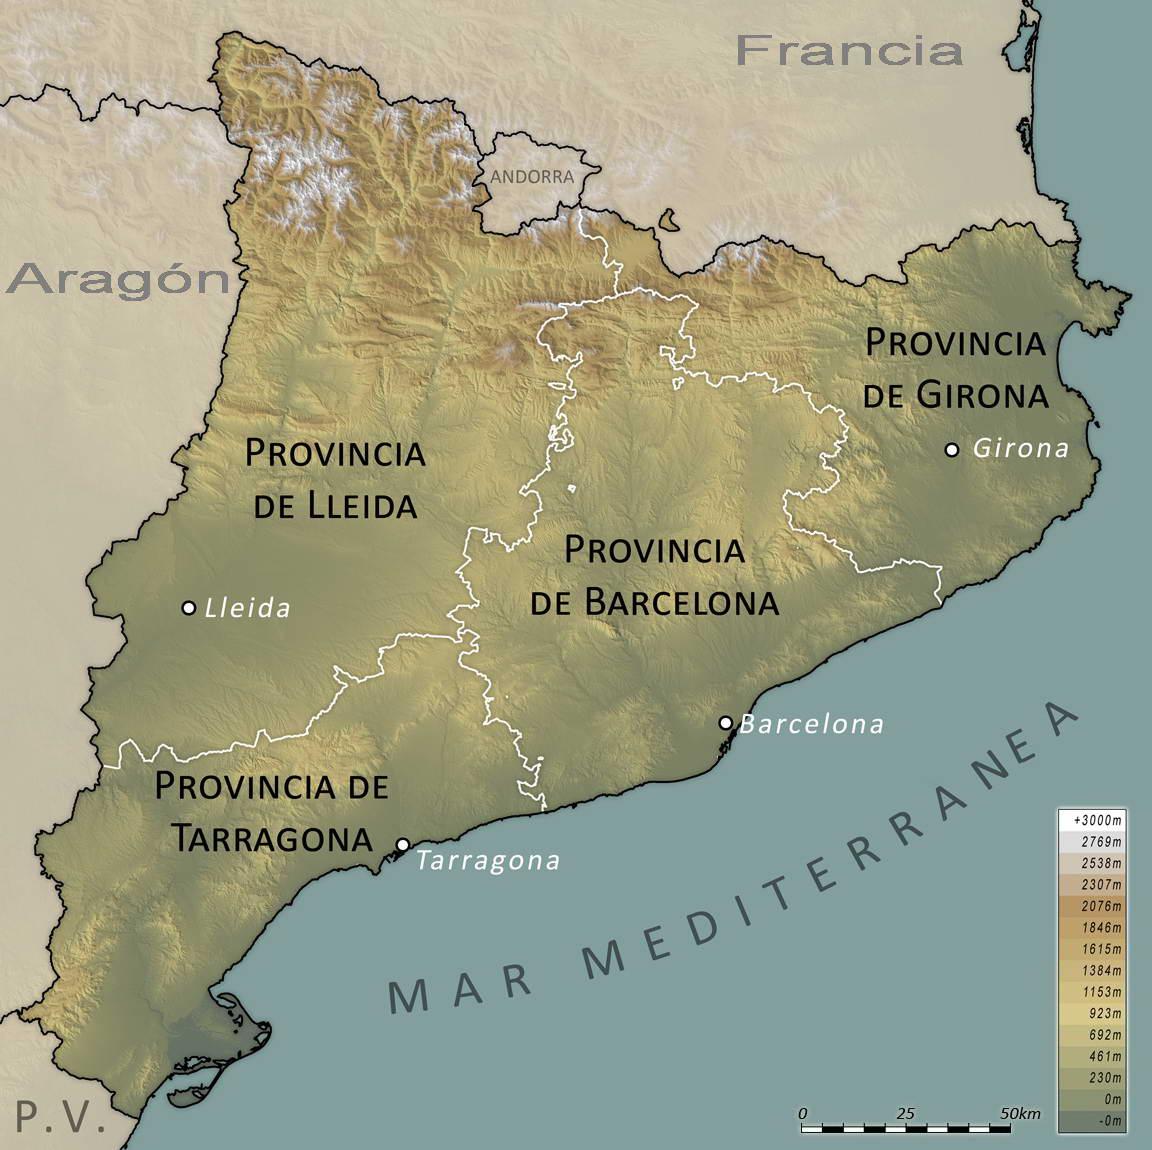 Mapa físico provincial de Cataluña